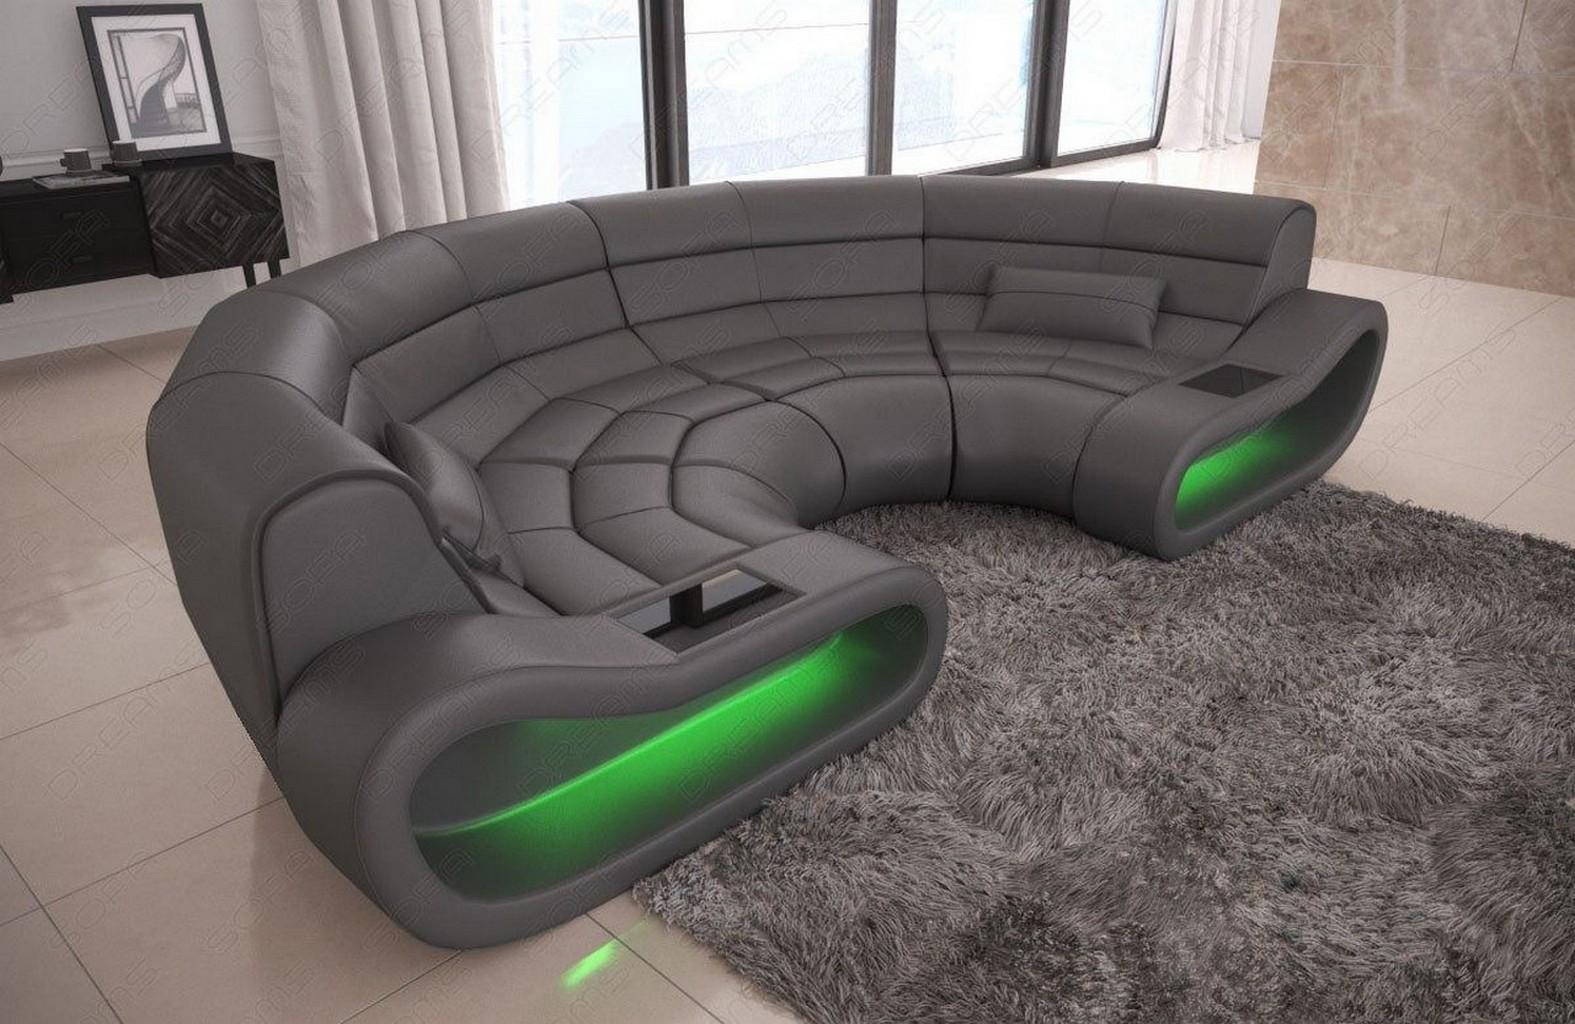 bigsofa ledercouch design luxus eckcouch concept led. Black Bedroom Furniture Sets. Home Design Ideas